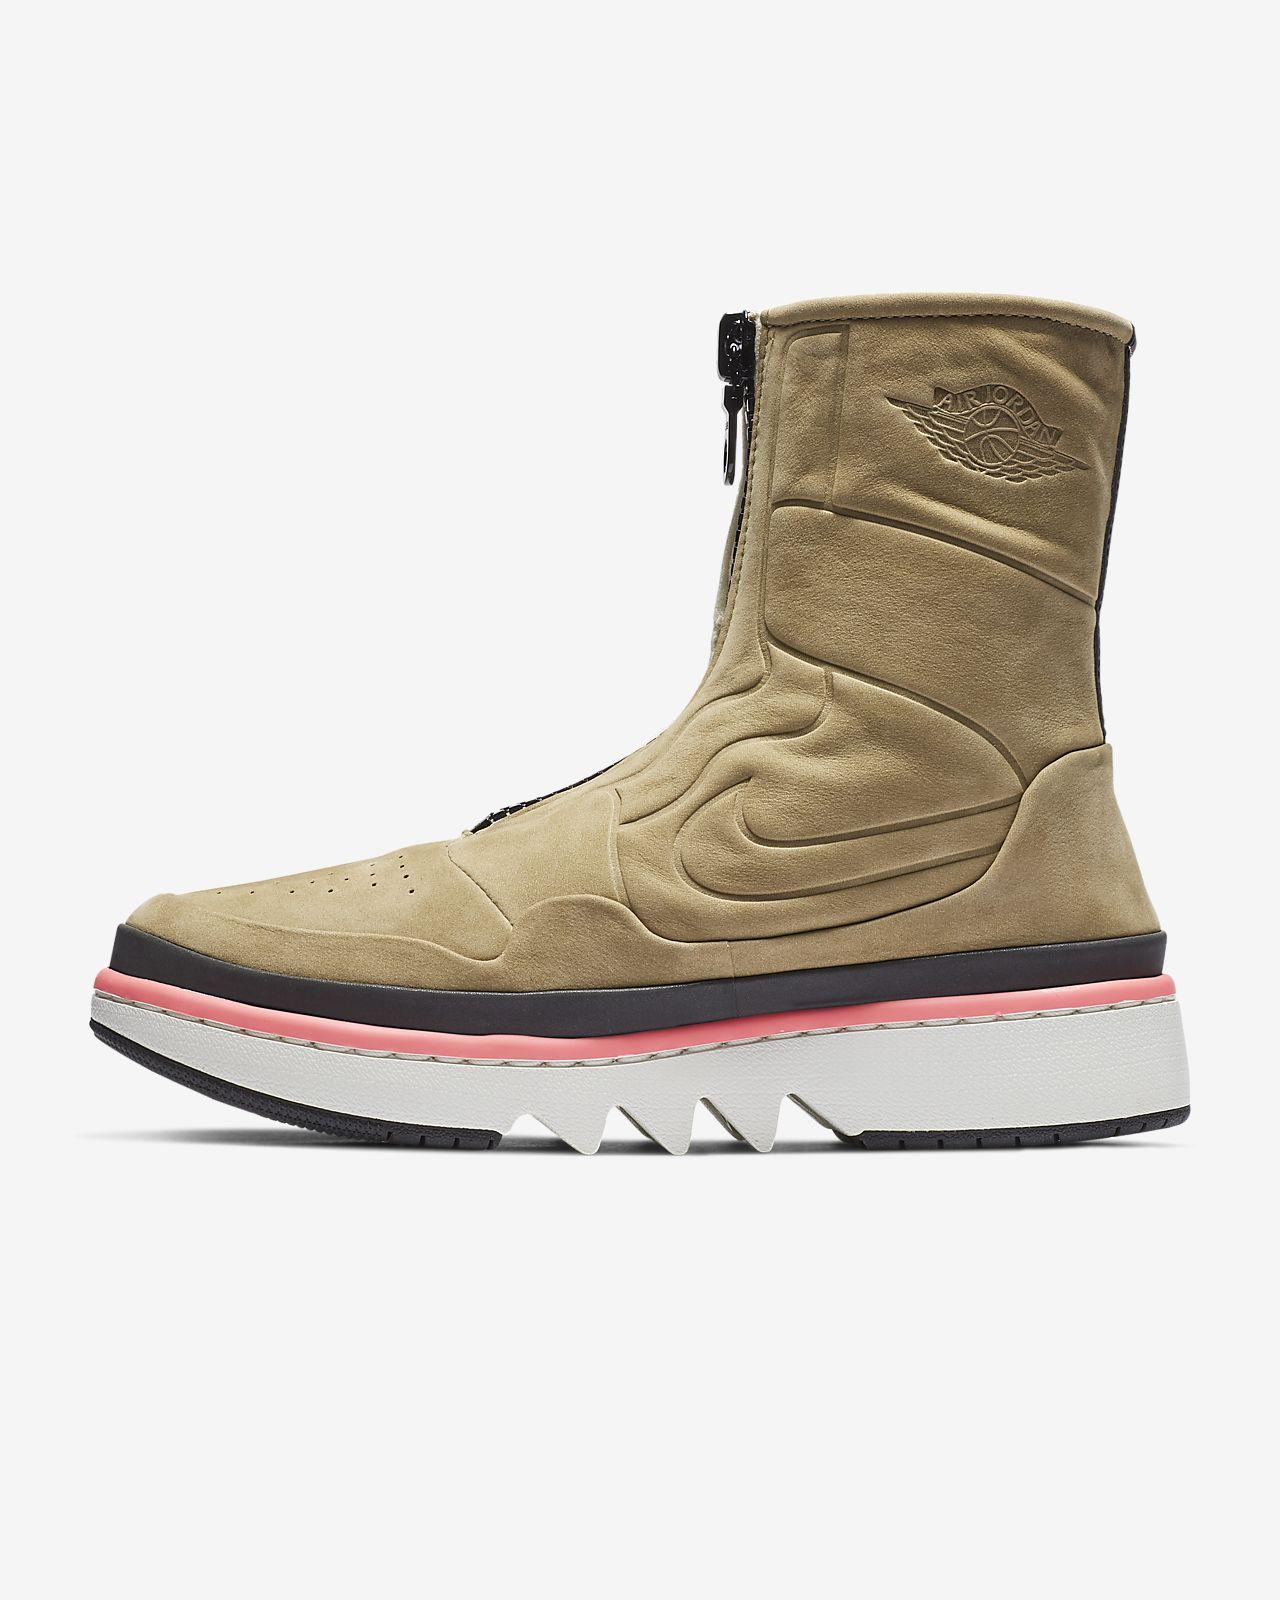 43657b44568d77 Air Jordan 1 Jester XX Utility Pack Women s Shoe. Nike.com IN